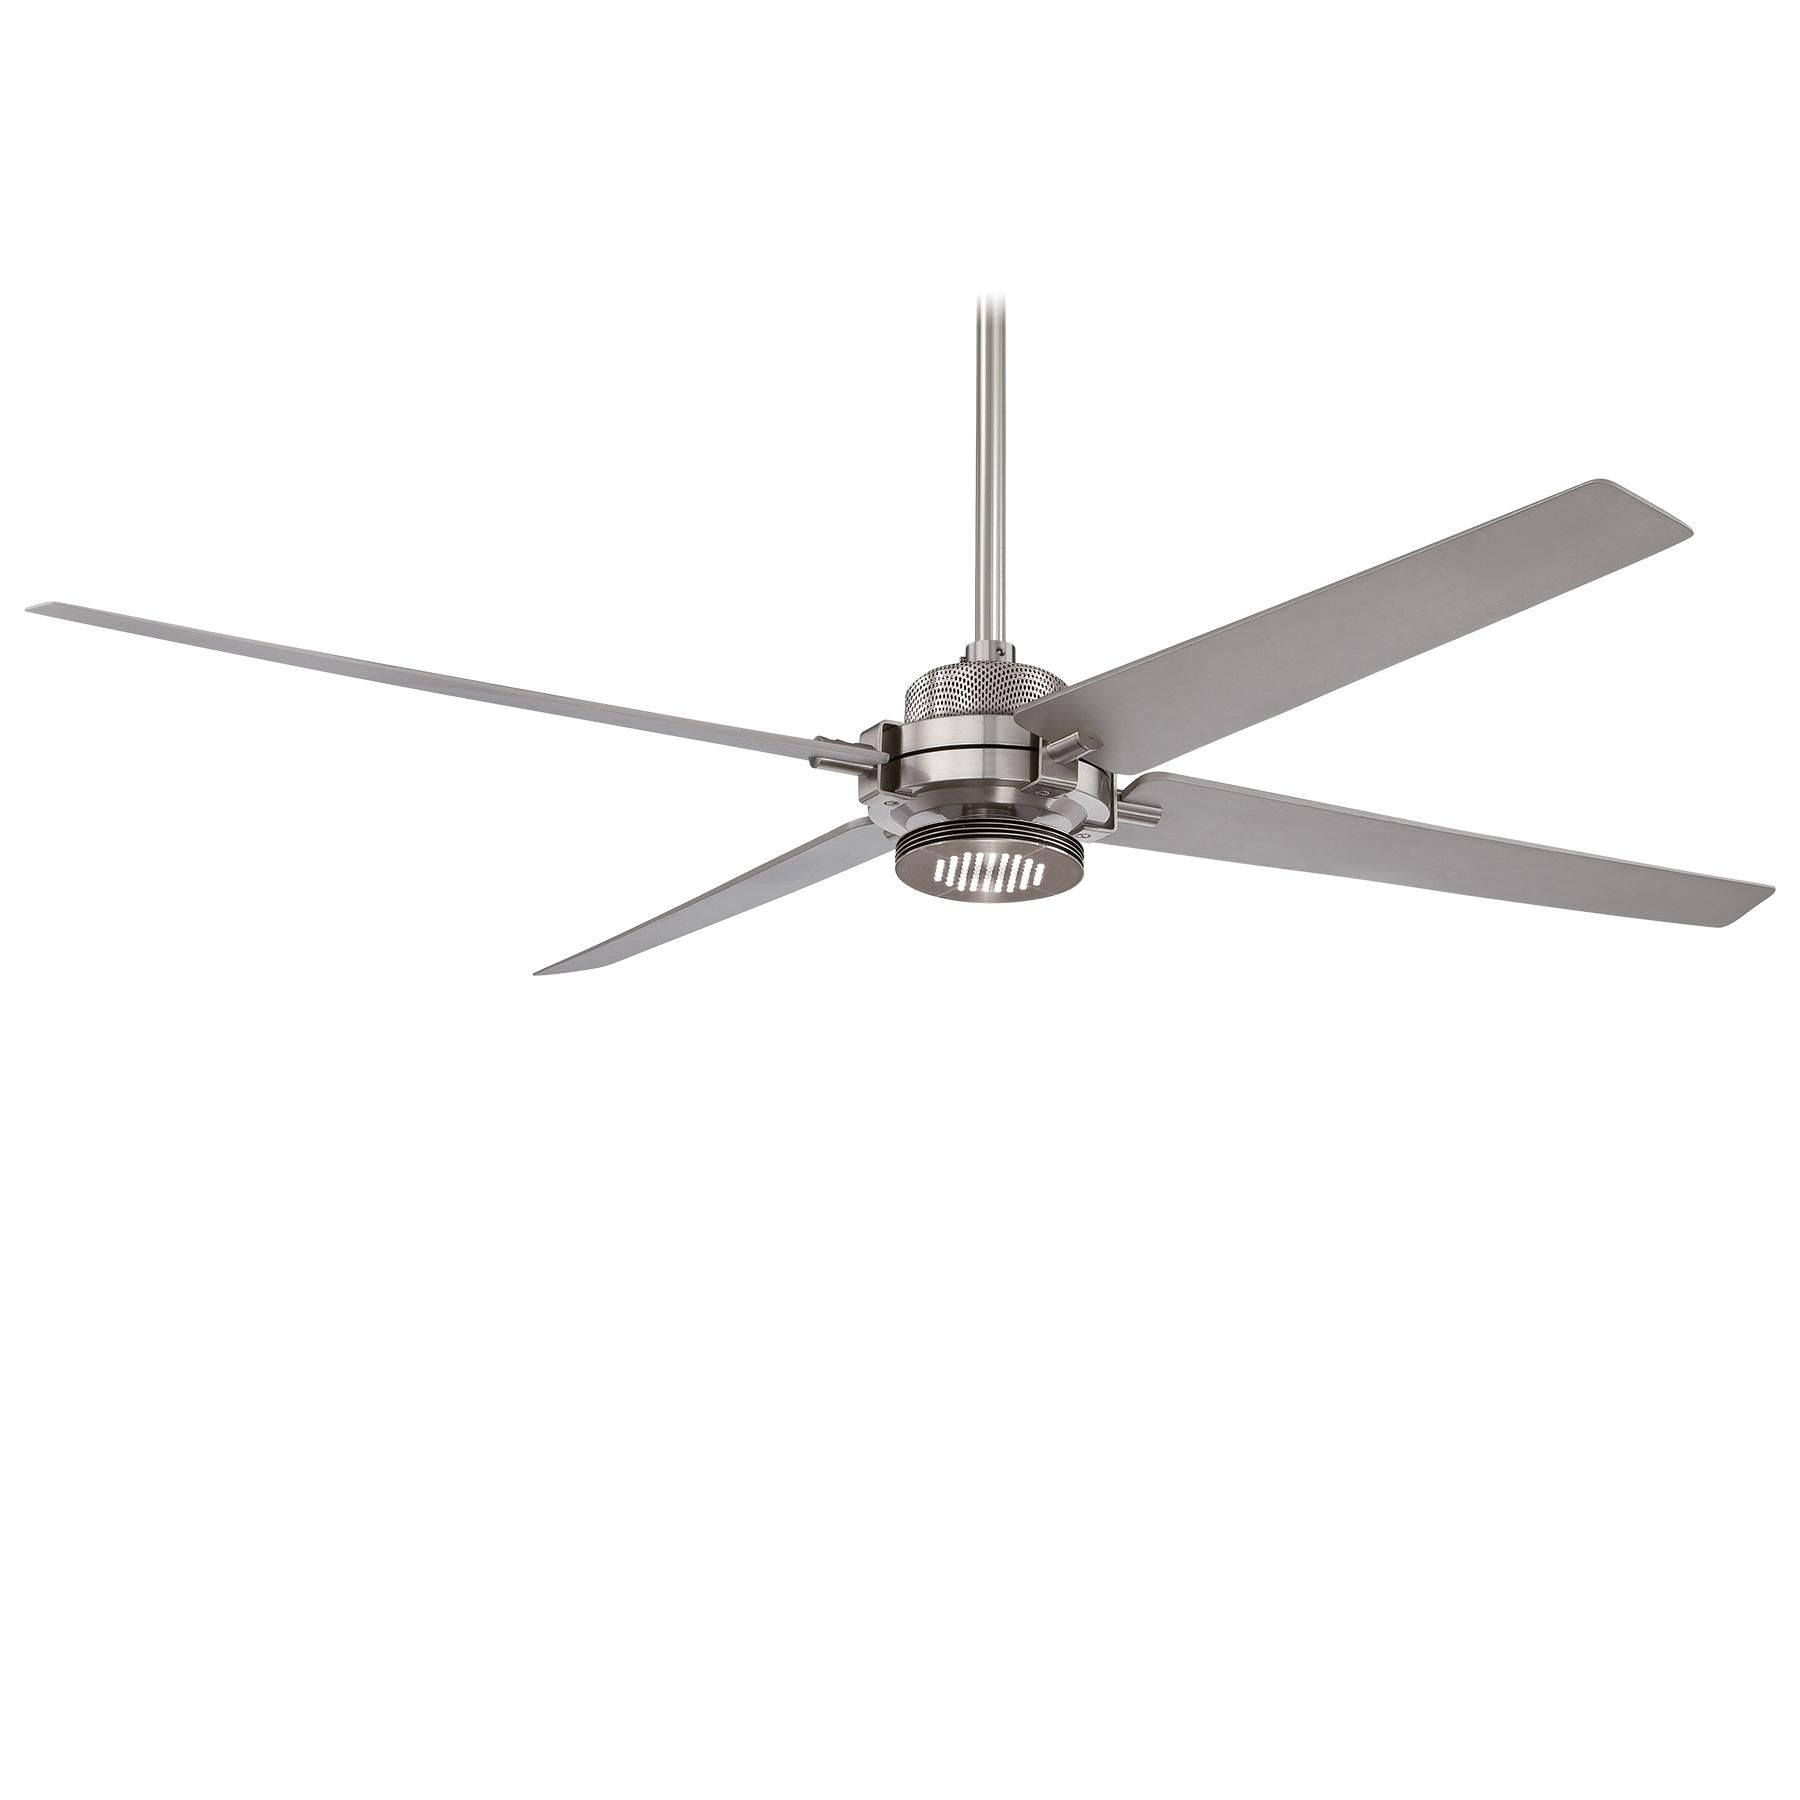 Spectre Ceiling Fan With Light By Minka Aire F726 Bn Sl